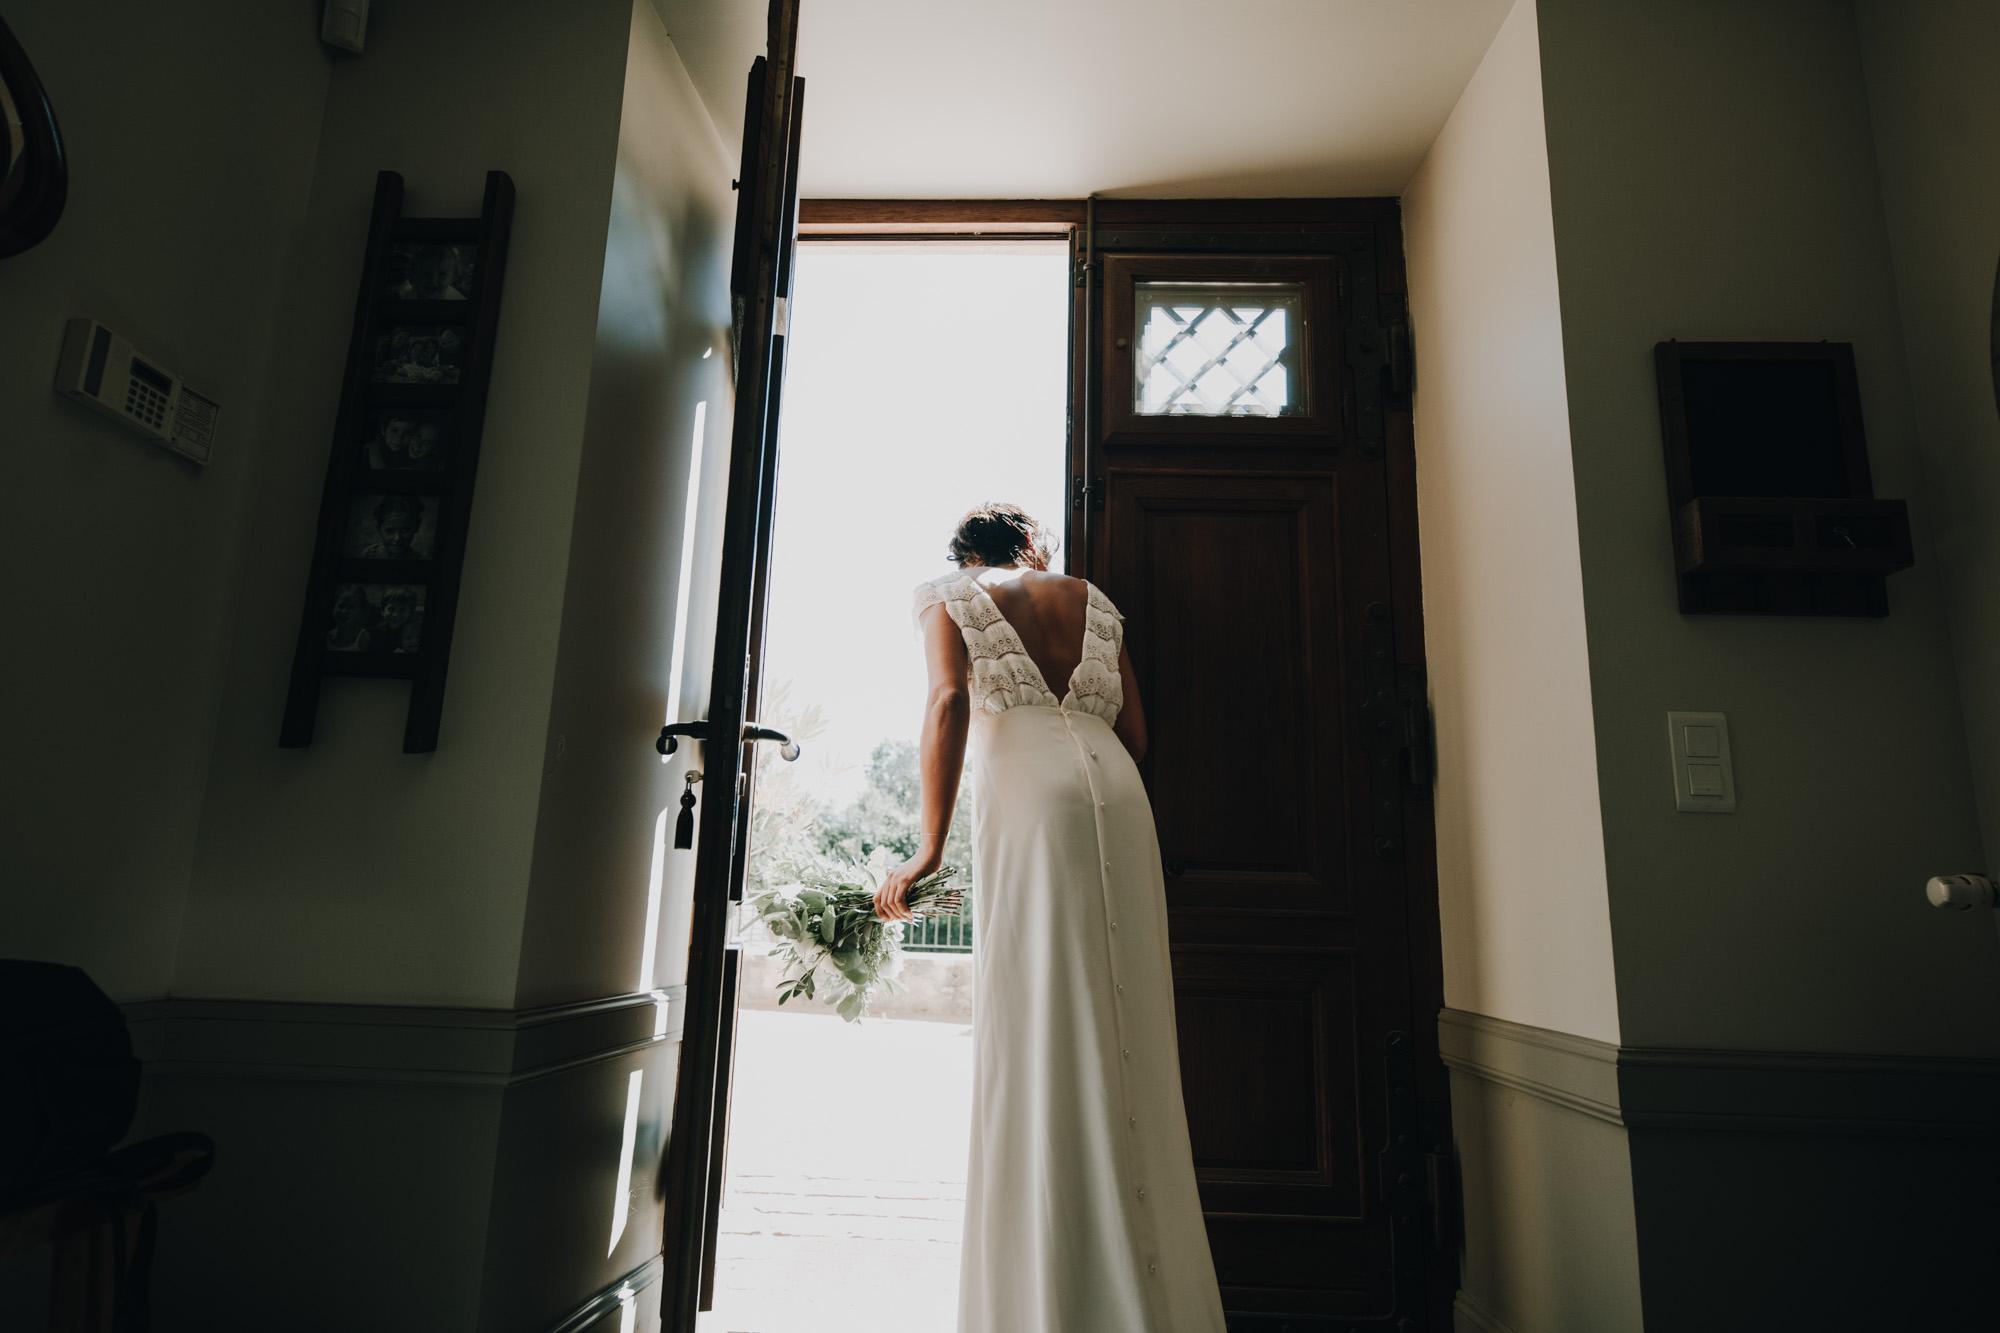 2018-09-08 - LD8_5363 - photographe mariage lyon - laurie diaz - www.lauriediazweeding.com.jpg